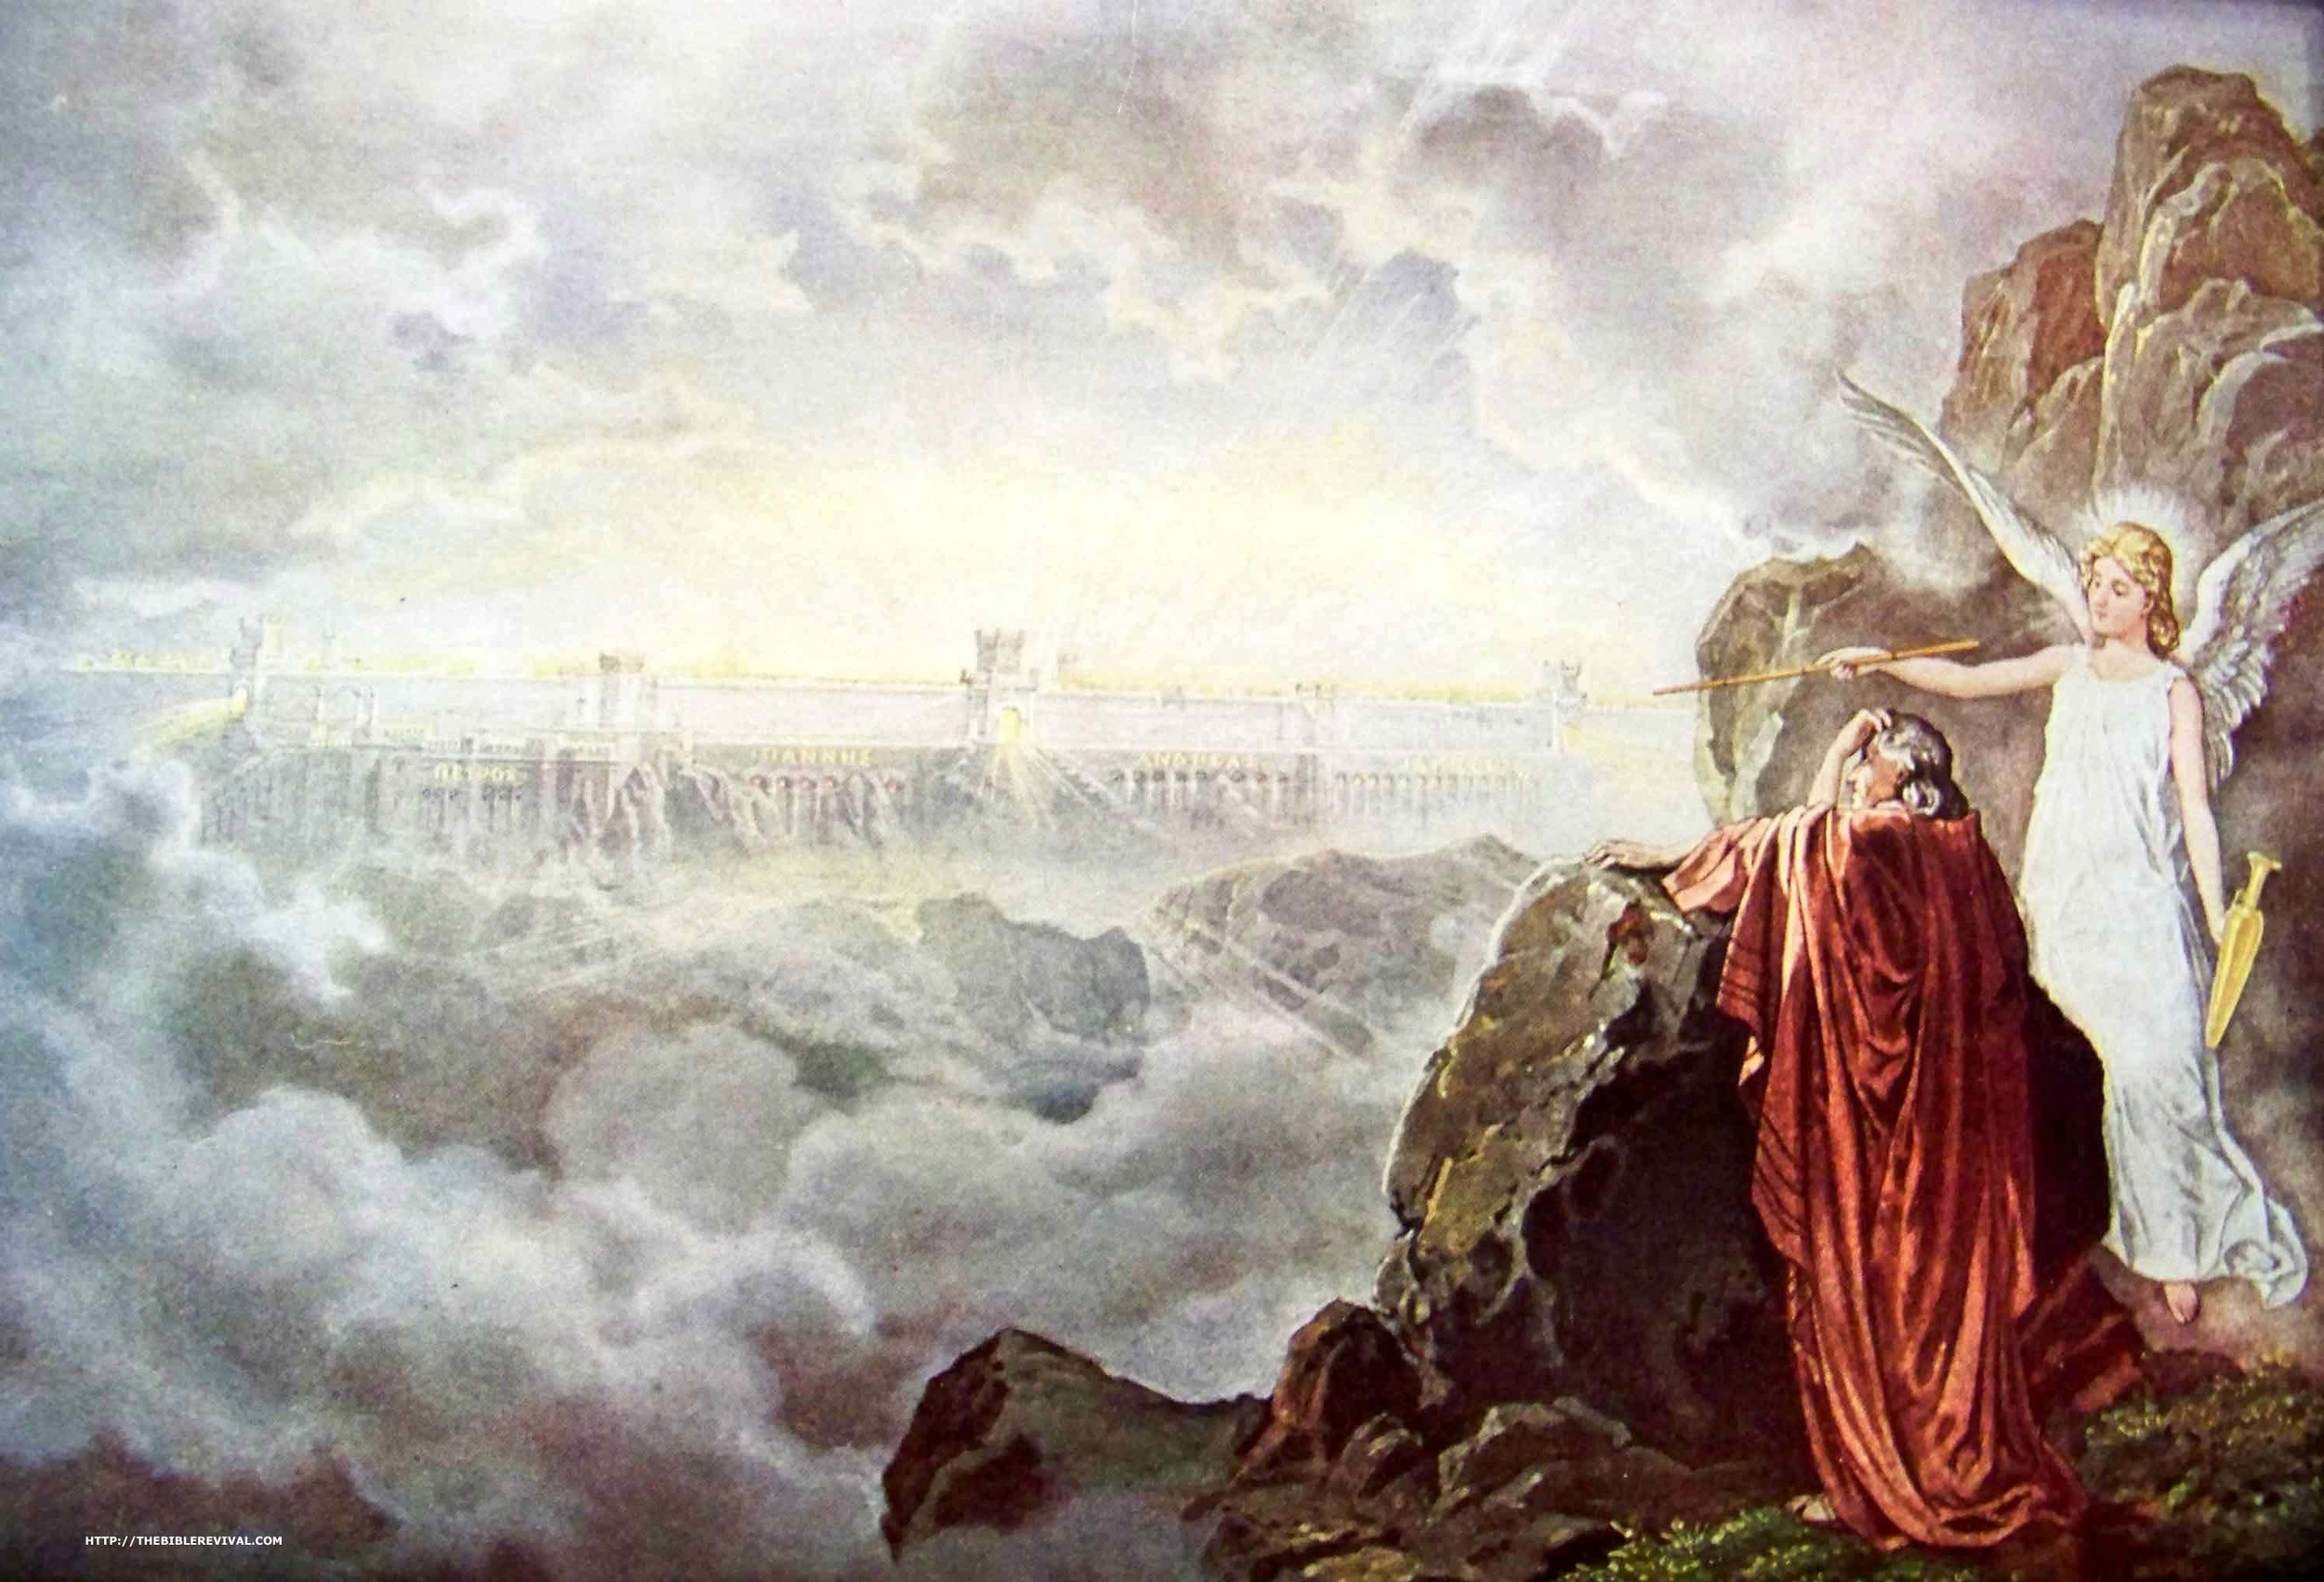 rev. 21.3 - god's dwelling place